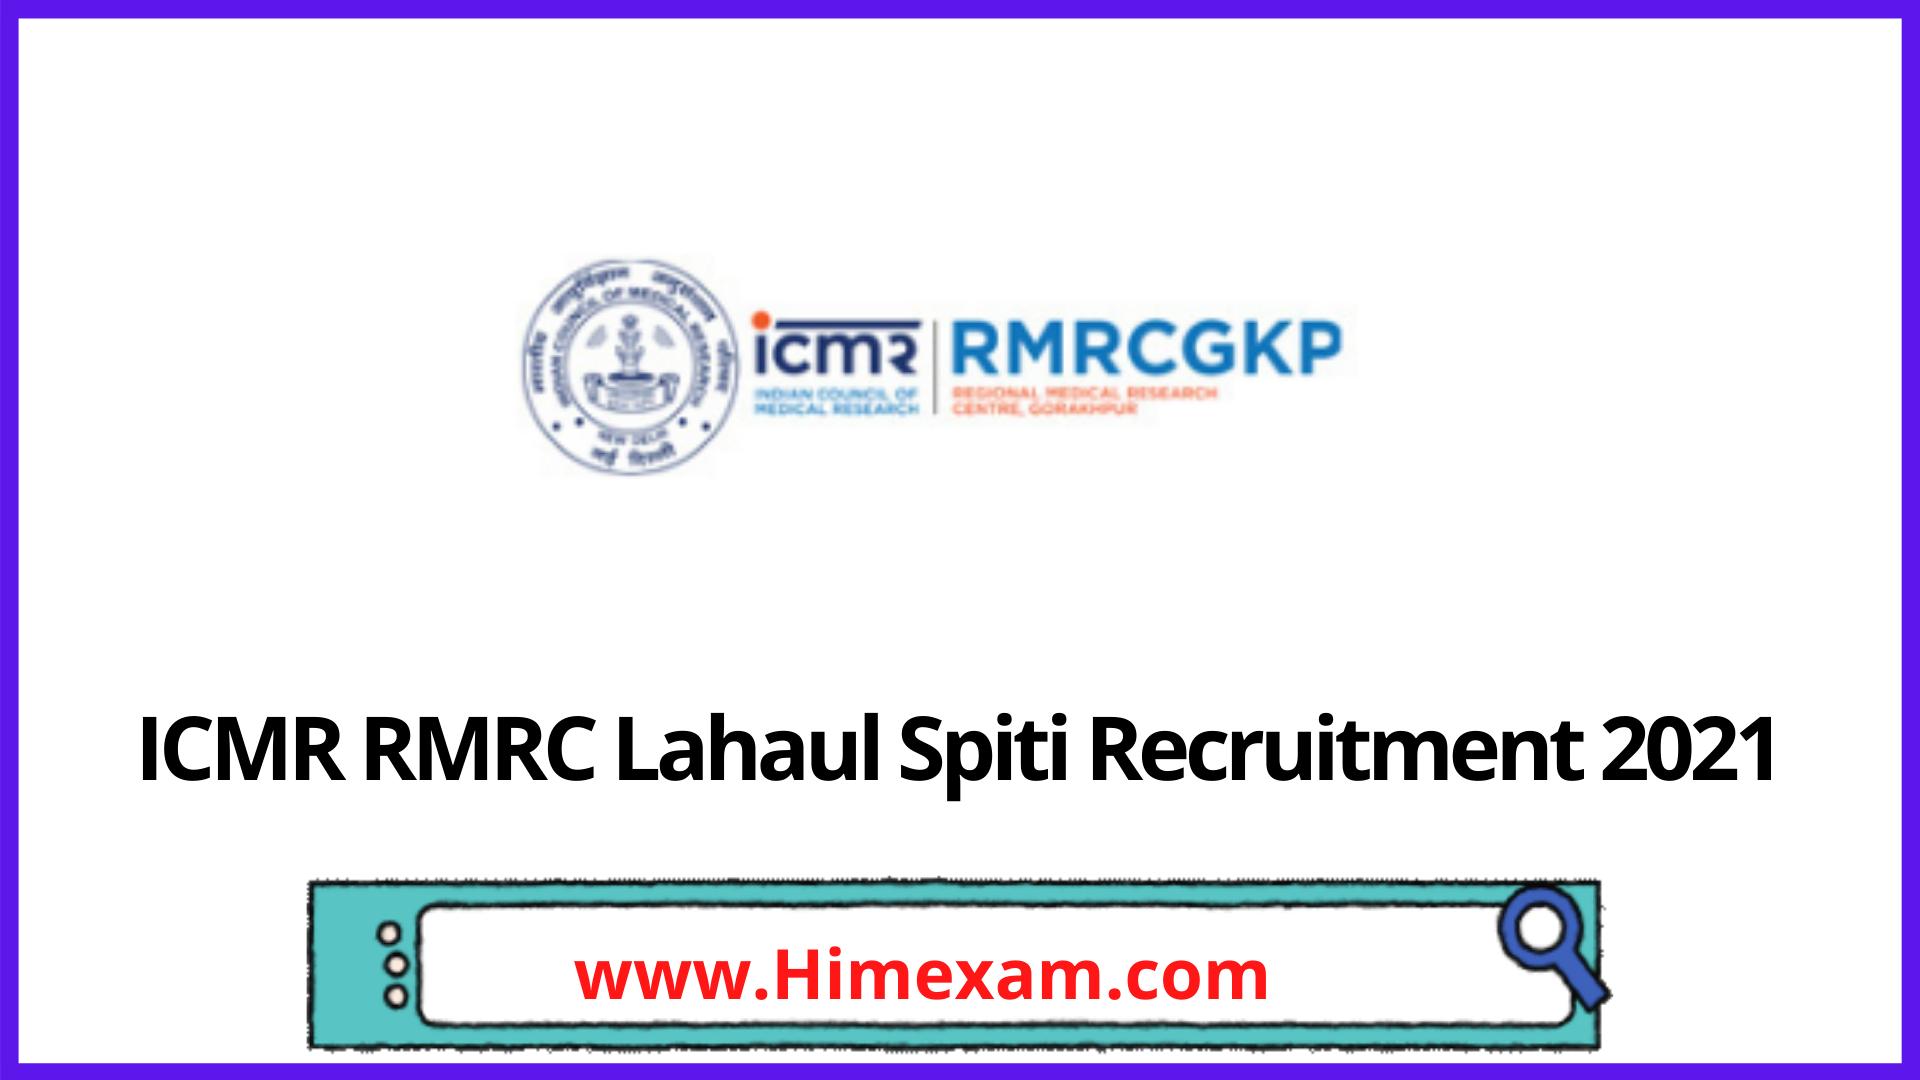 ICMR RMRC Lahaul Spiti Recruitment 2021